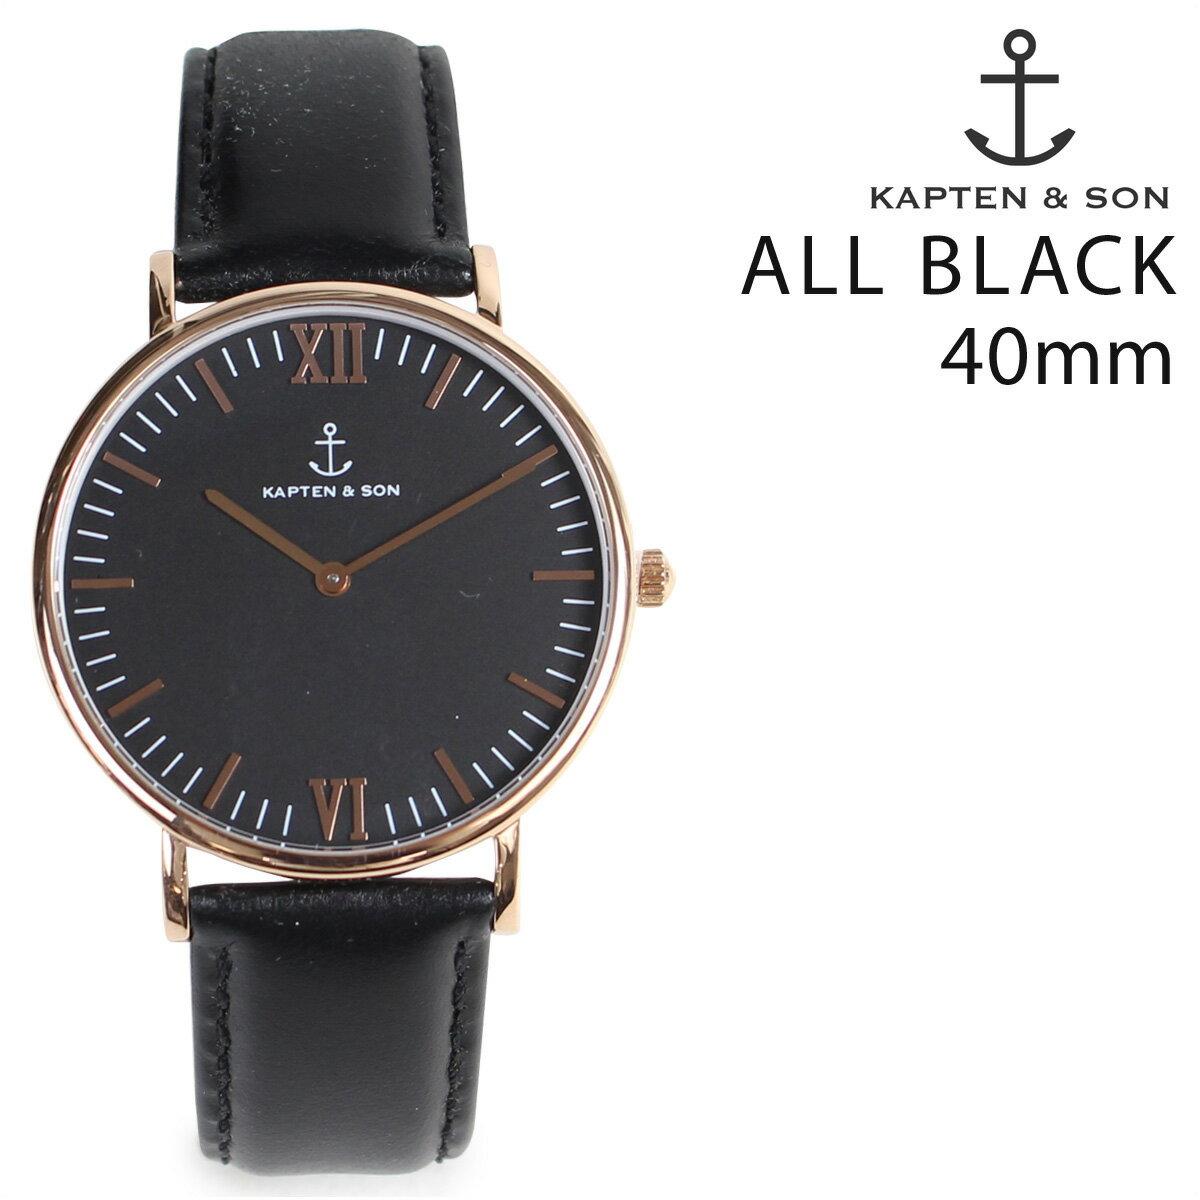 KAPTEN&SON4 キャプテンアンドサン 腕時計 時計 レディース 40mm レザー ALL BLACK ブラック